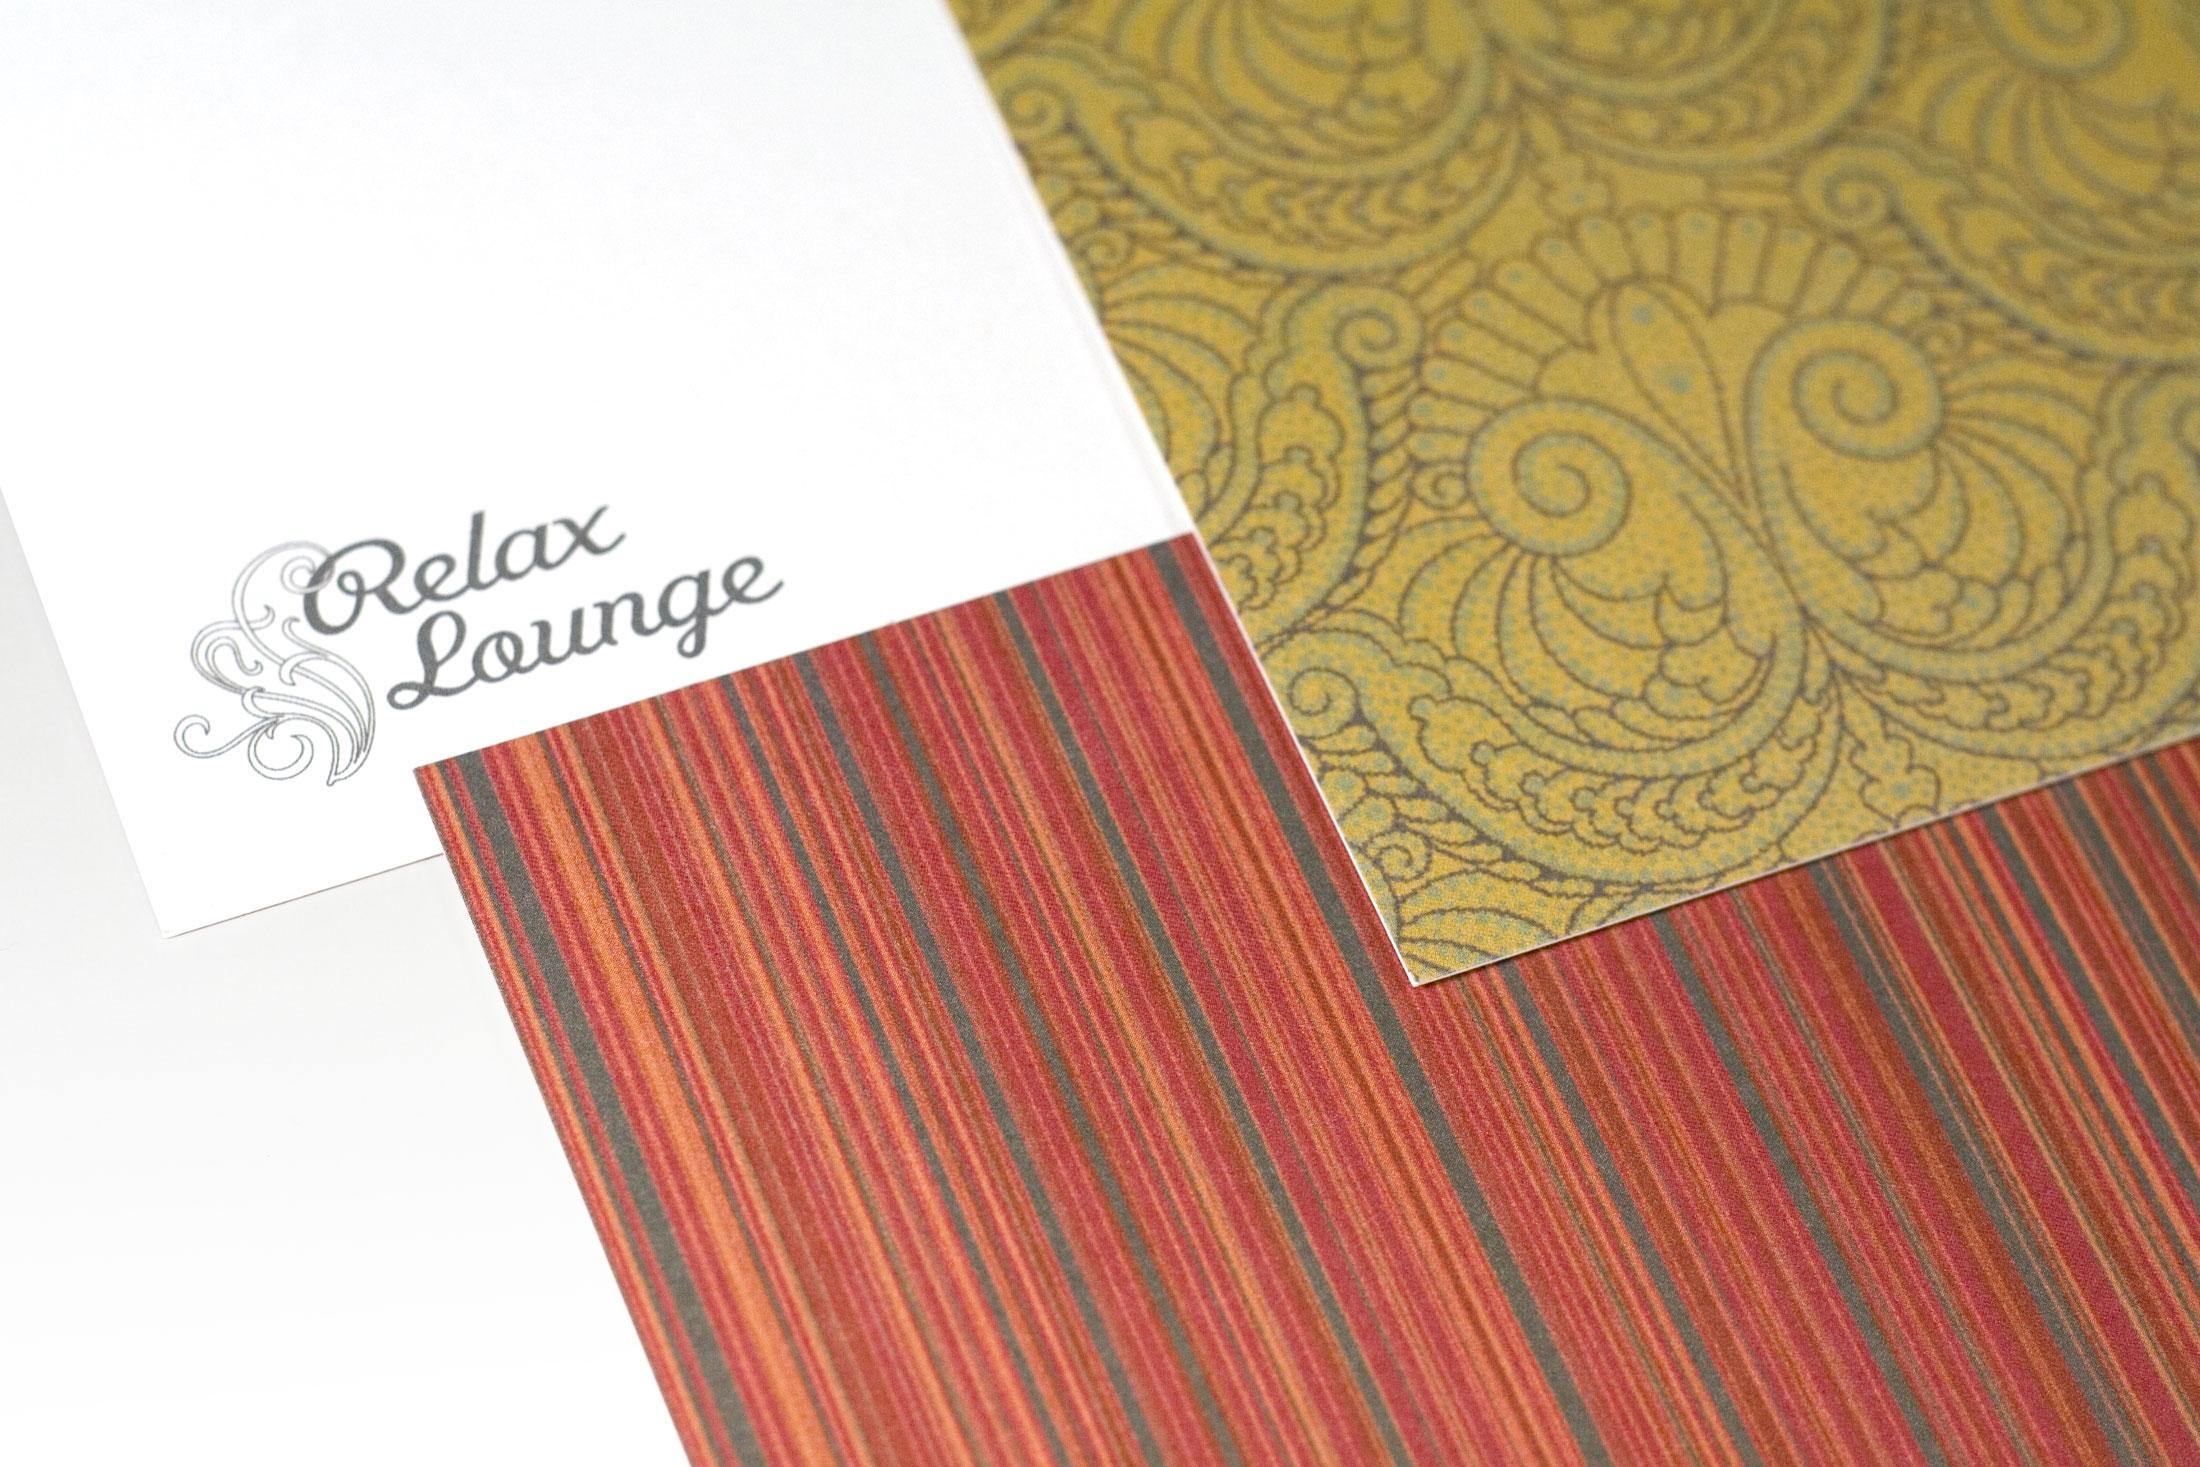 Relax Lounge. Pattern creation from original interior design.